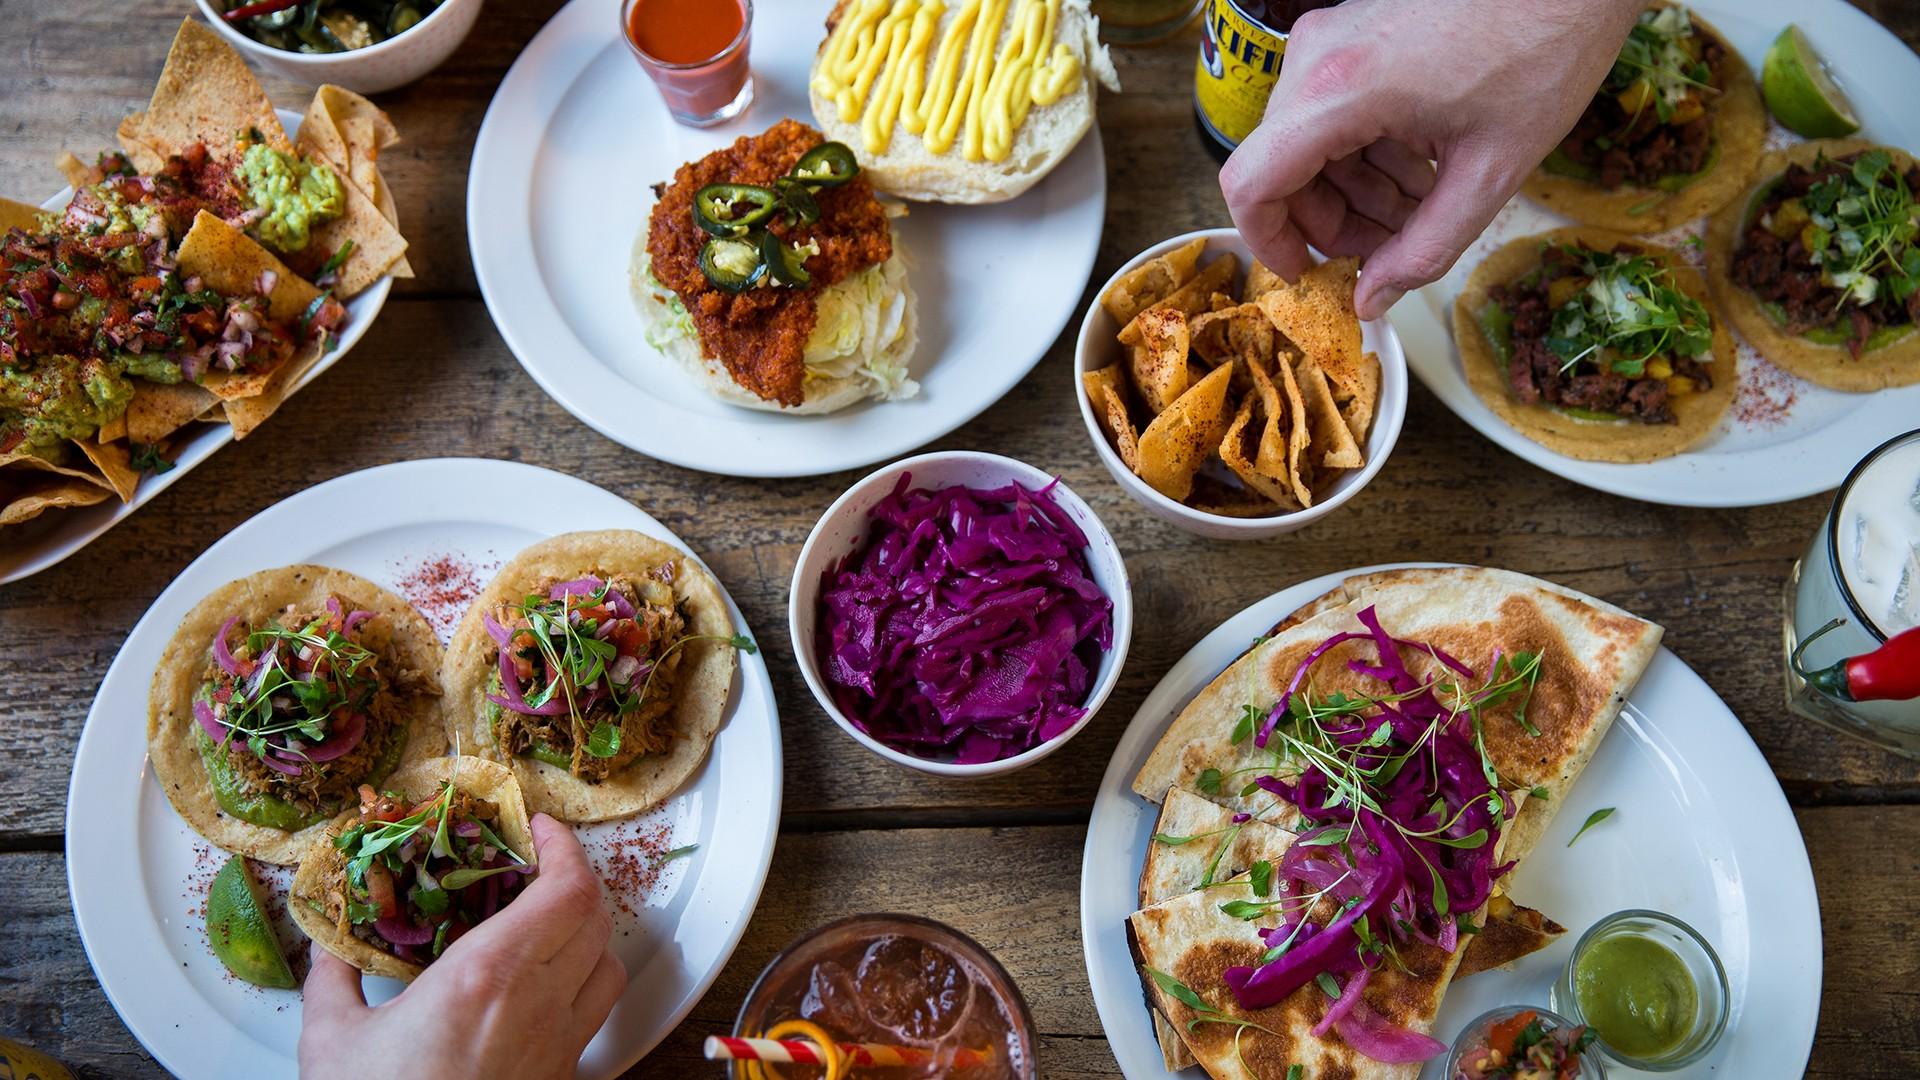 Sustainable restaurants London: The Spread Eagle